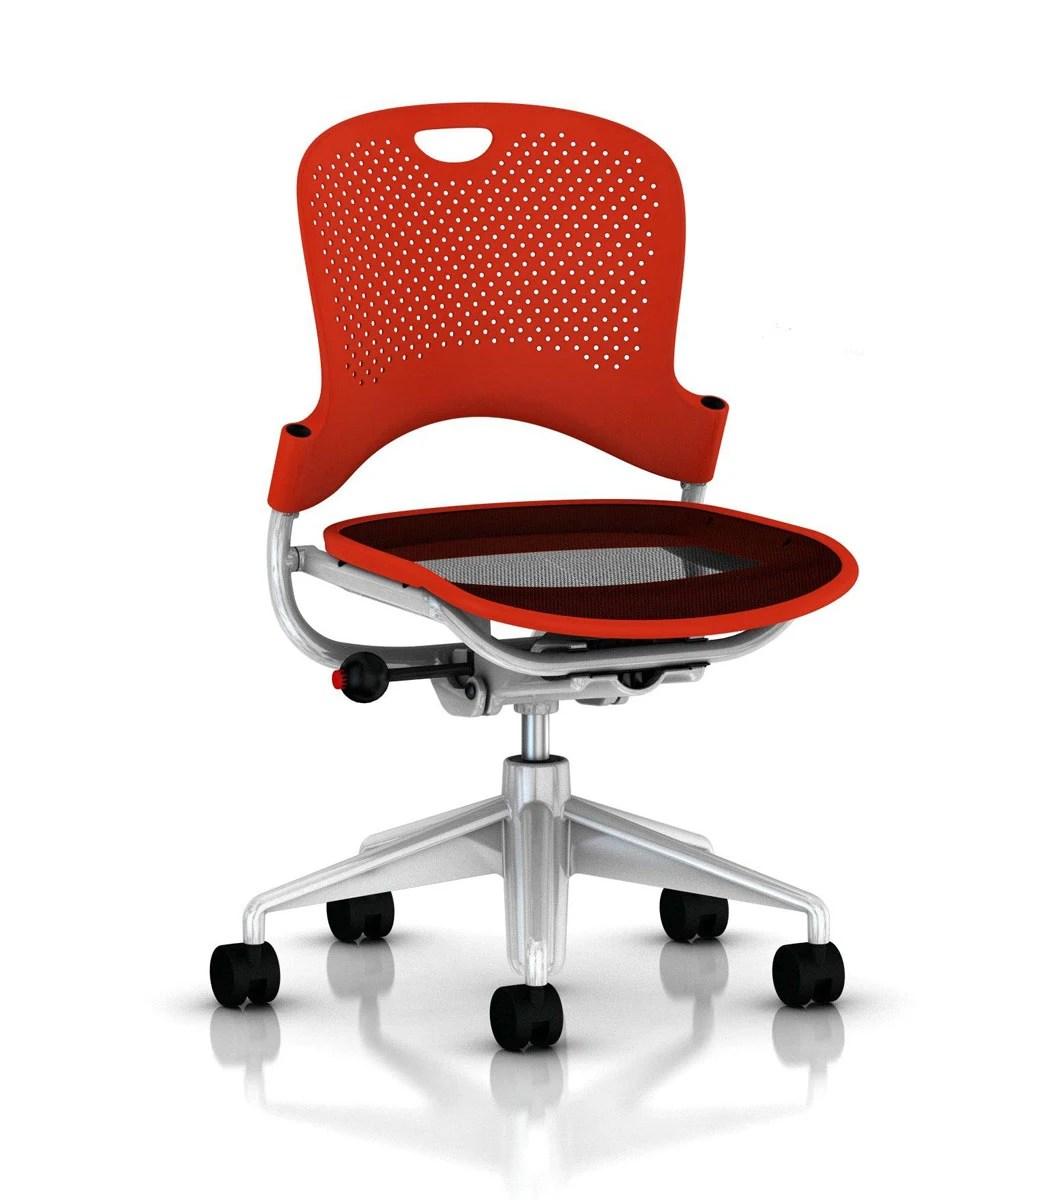 herman miller caper chair cushion covers walmart multipurpose gr shop canada